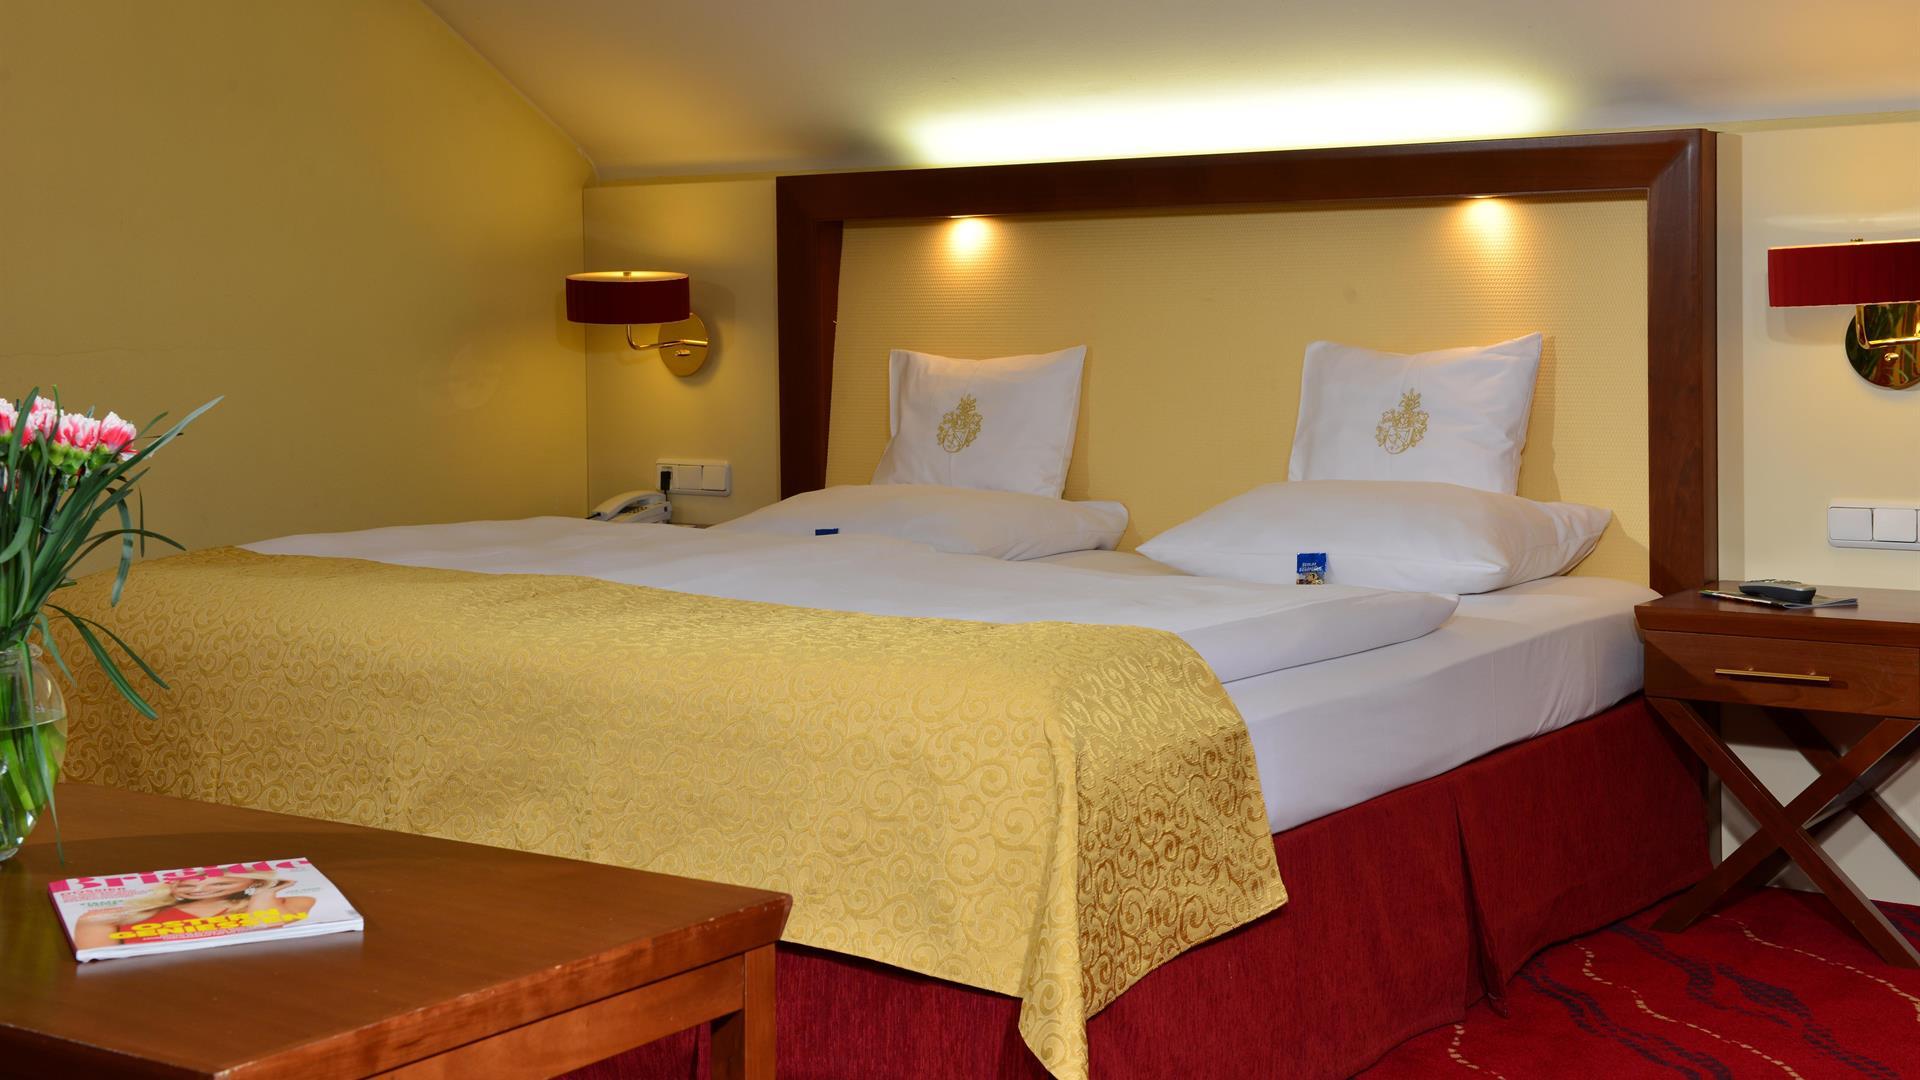 hotelzimmer m nchen ost 4 sterne hotel erb parsdorf vaterstetten m nchen messe ost. Black Bedroom Furniture Sets. Home Design Ideas